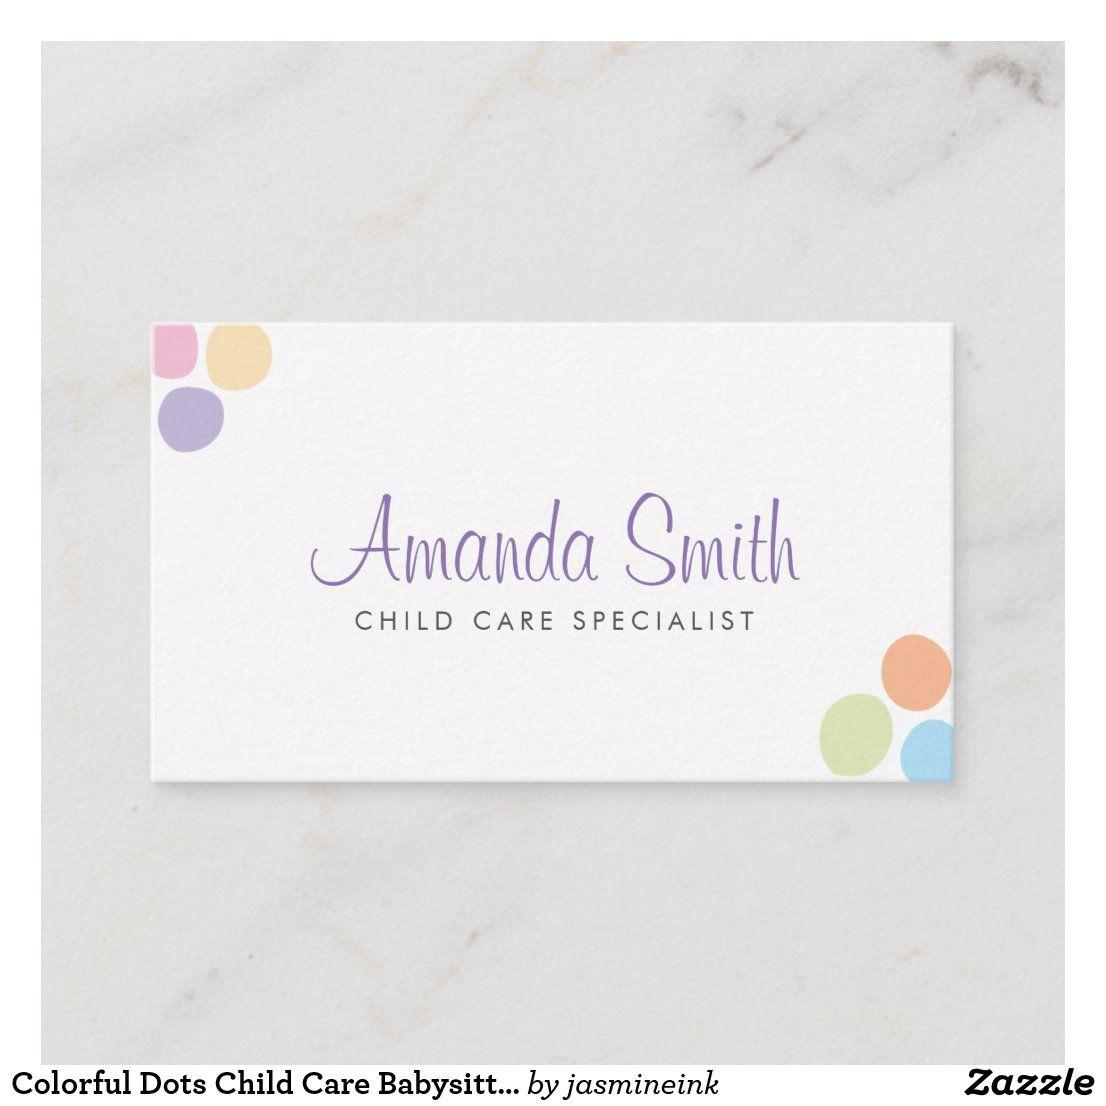 Colorful Dots Child Care Babysitting Business Card Zazzle Com Babysitting Childcare Toddler Skills